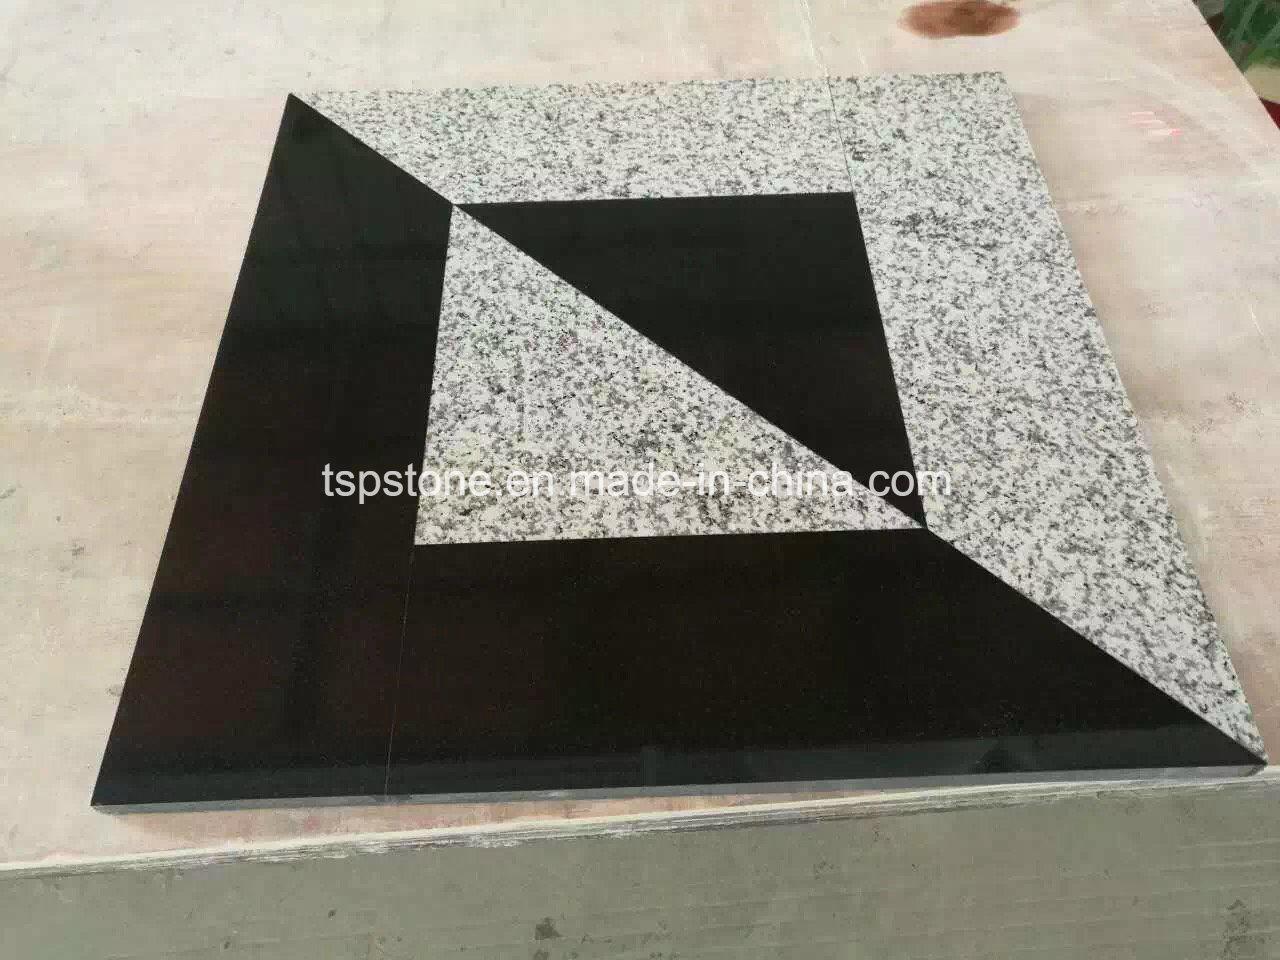 Chinese Grey Black Granite Floor Tile China Granite Floor Granite Tile